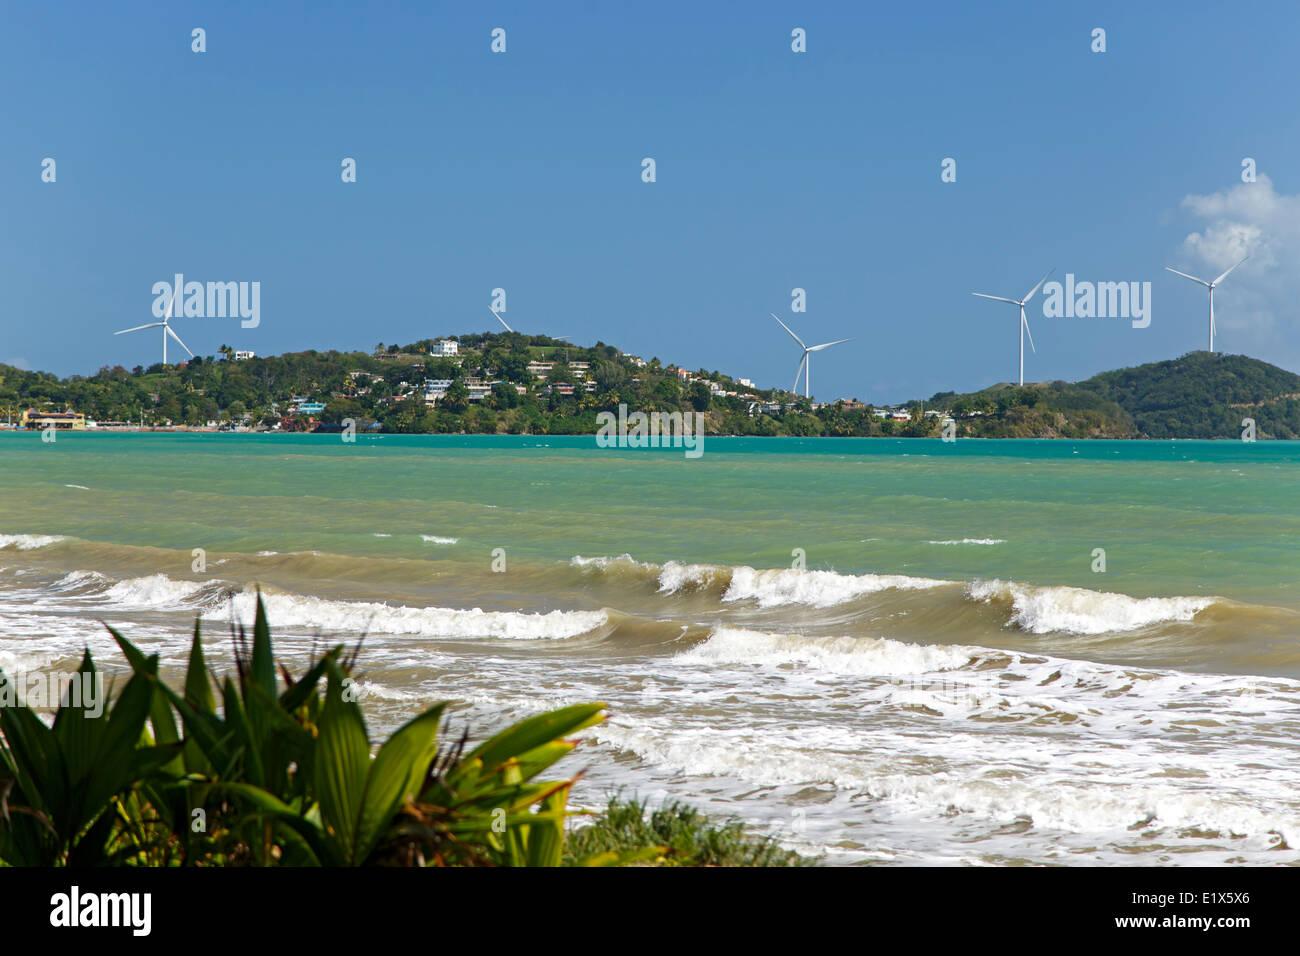 Ocean, hills and wind turbines, Naguabo, Puerto Rico - Stock Image